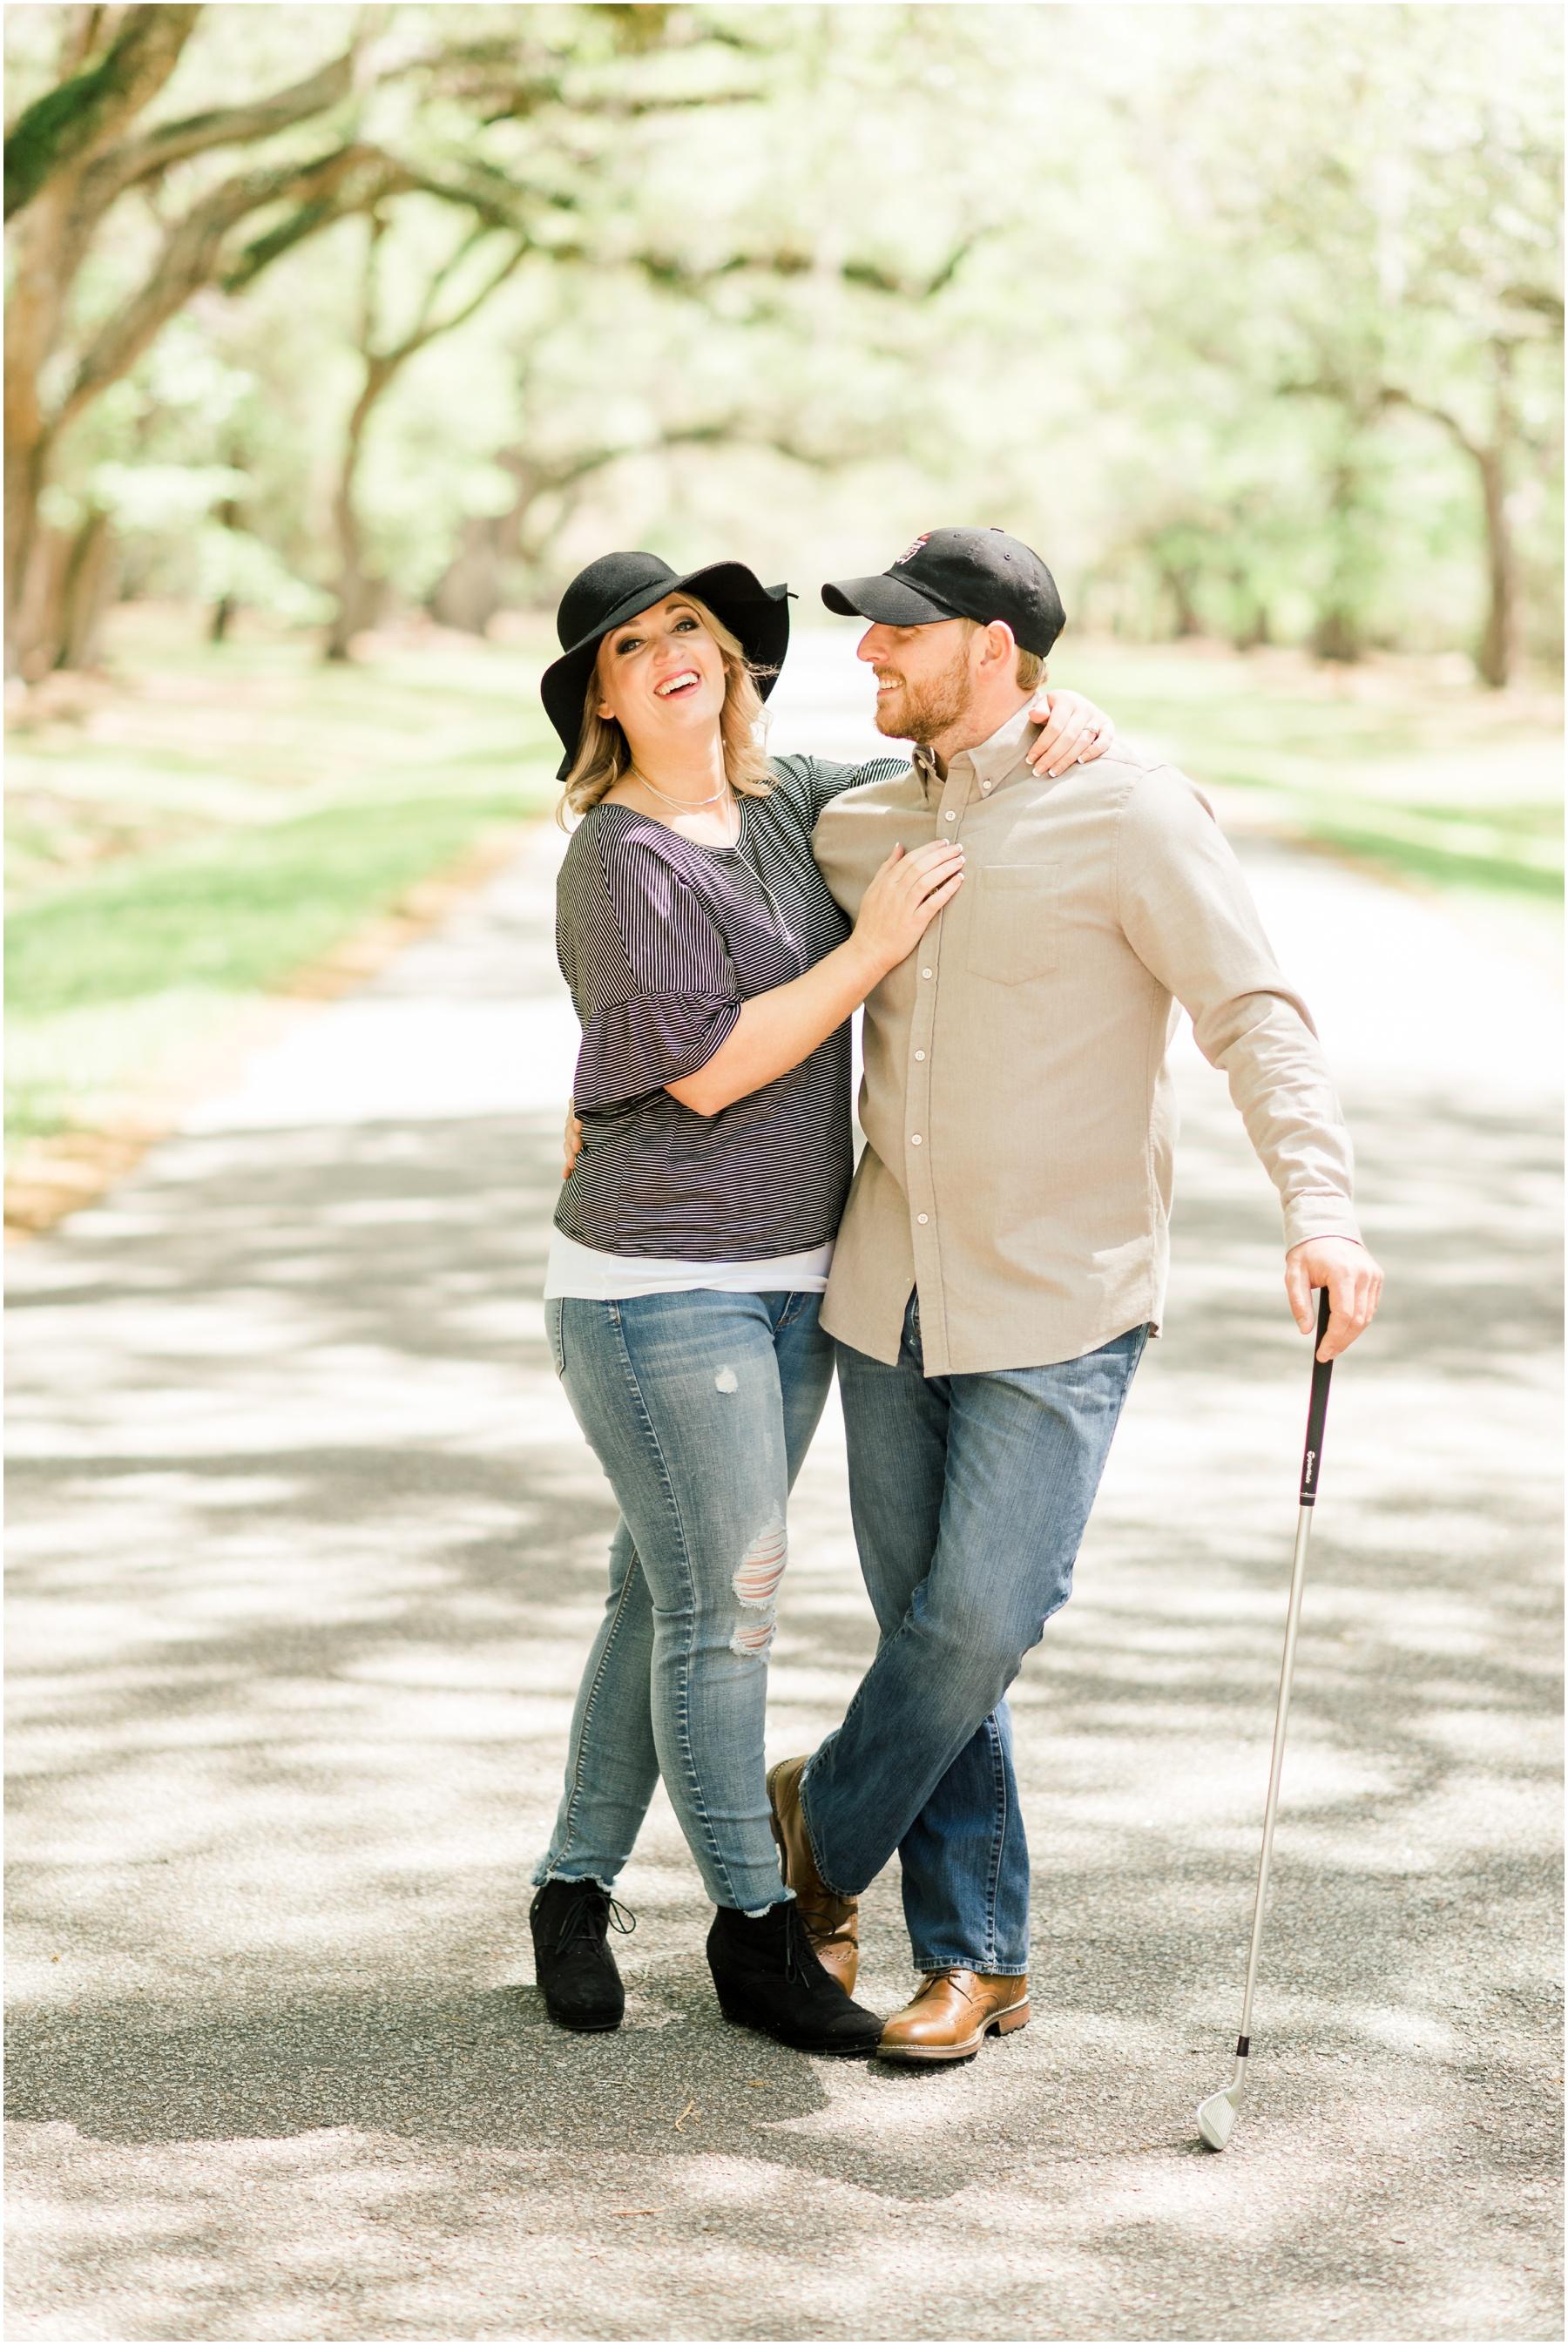 Mepkin-Abbey-Moncks-Corner-South-Carolina-Engagement-Session-Photos_0028.jpg